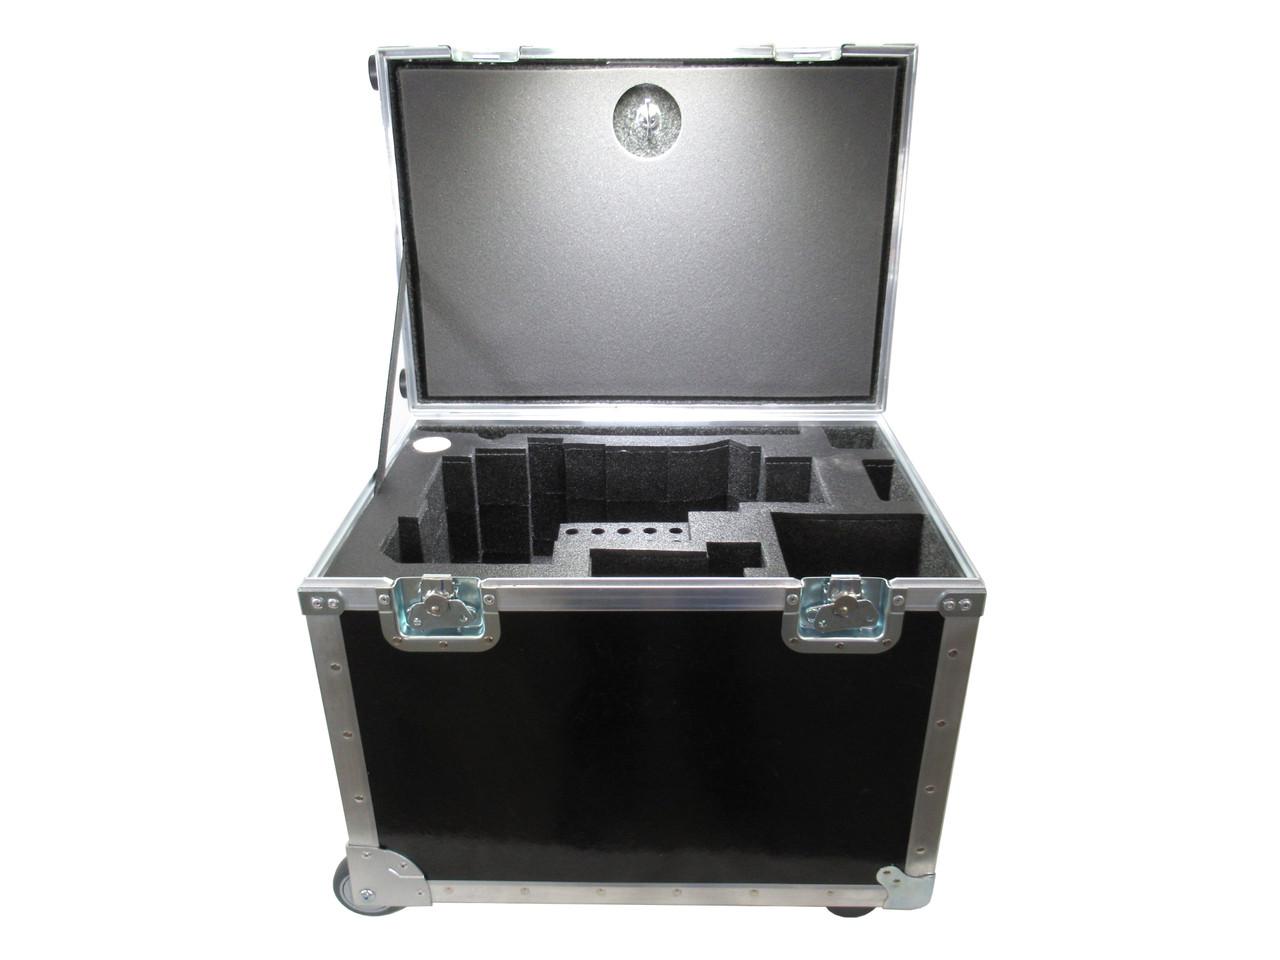 ARRI Alexa SXT-W Camera (Fully Built) Shipping Case